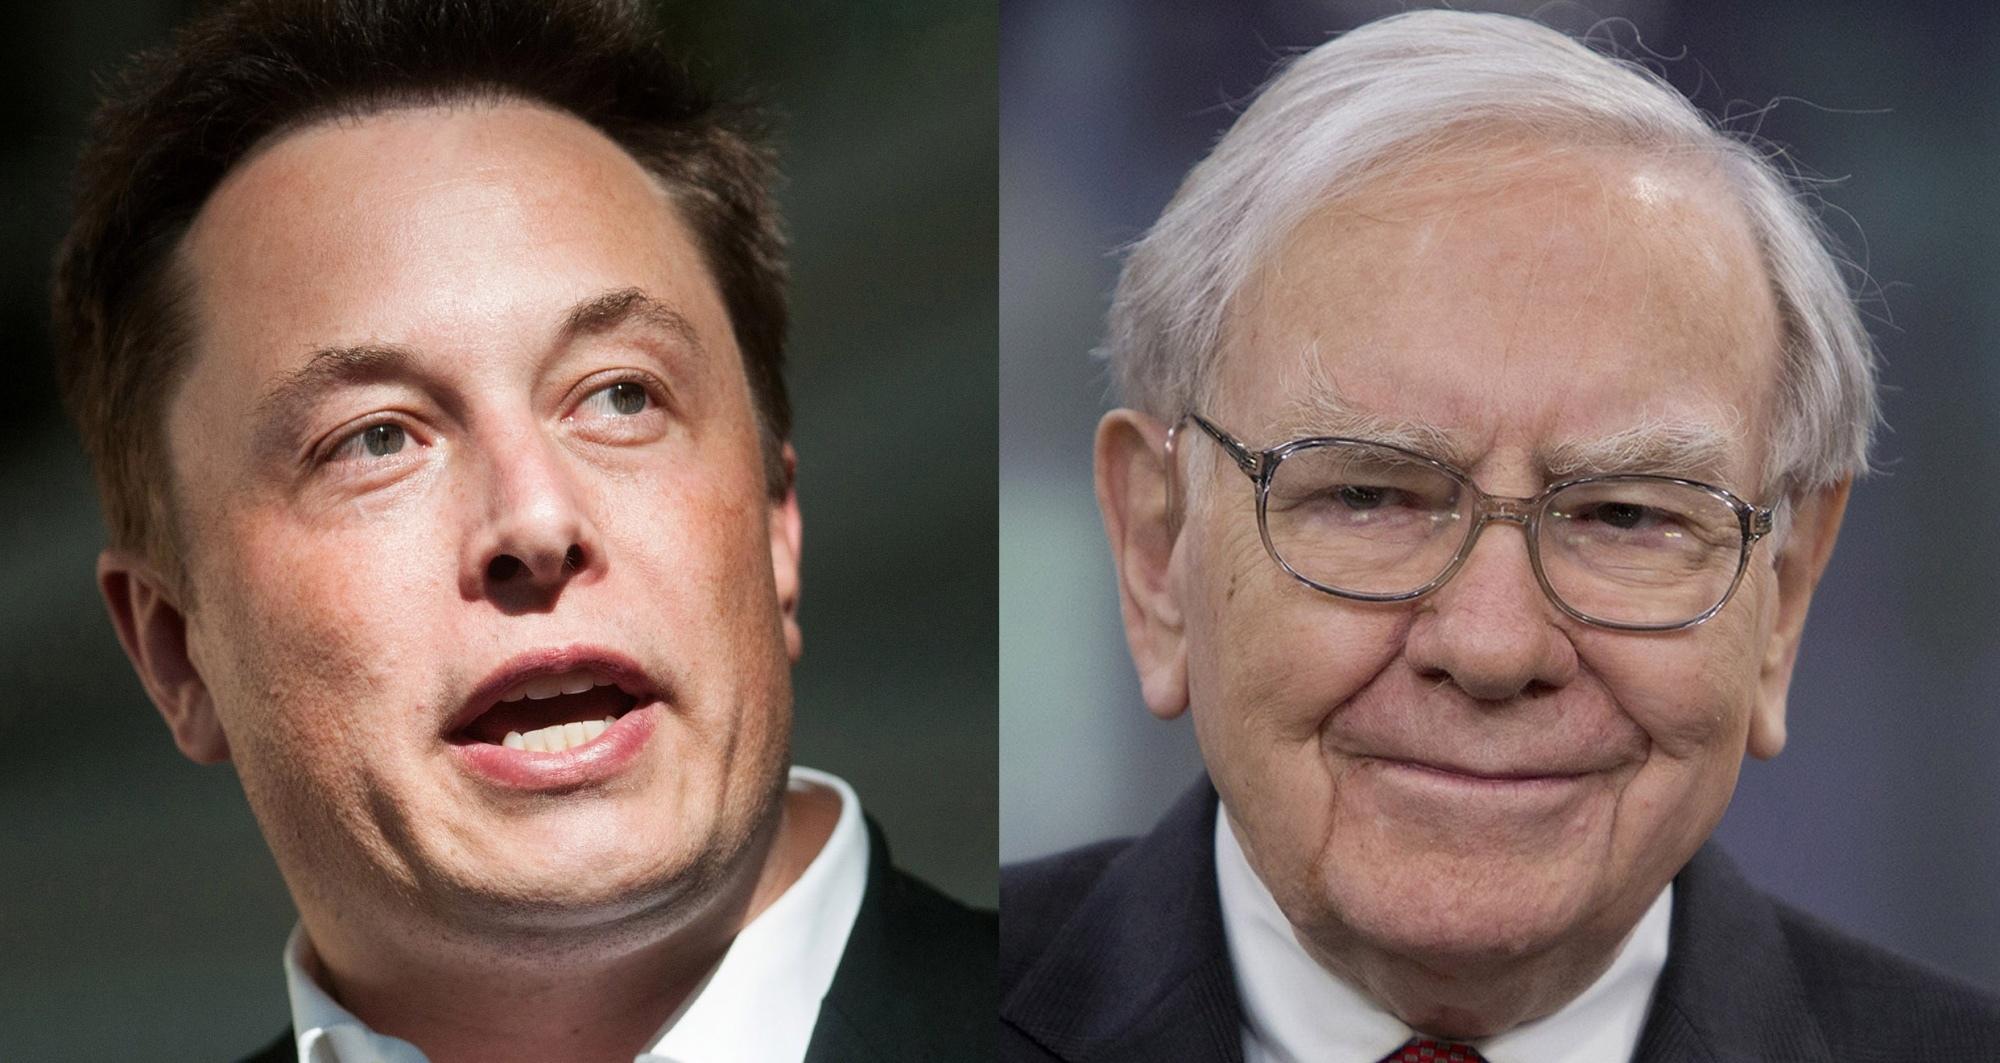 Elon Musk vượt mặt Warren Buffett trên bảng xếp hạng tỷ phú